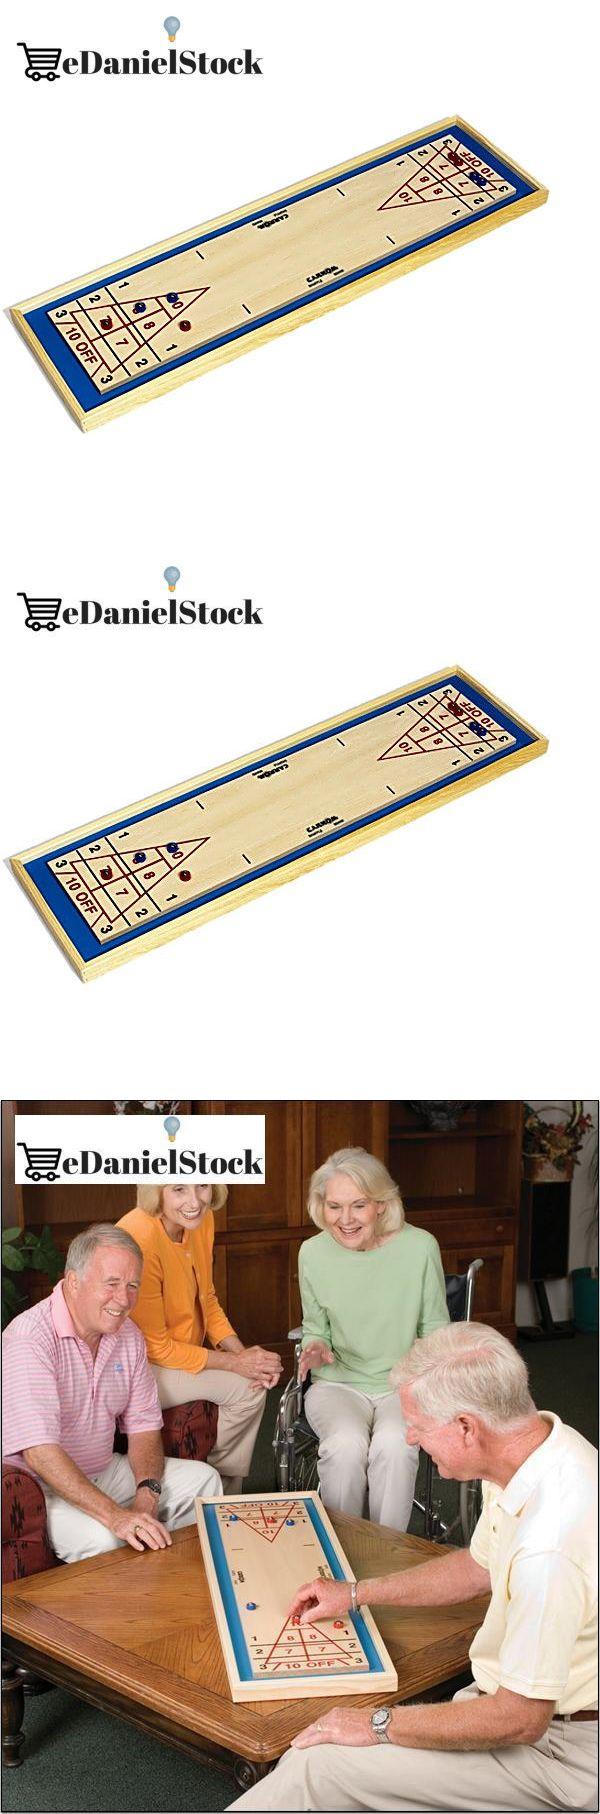 Shuffleboard 79777: Carrom Shuffleboard Game -> BUY IT NOW ONLY: $62.18 on eBay!